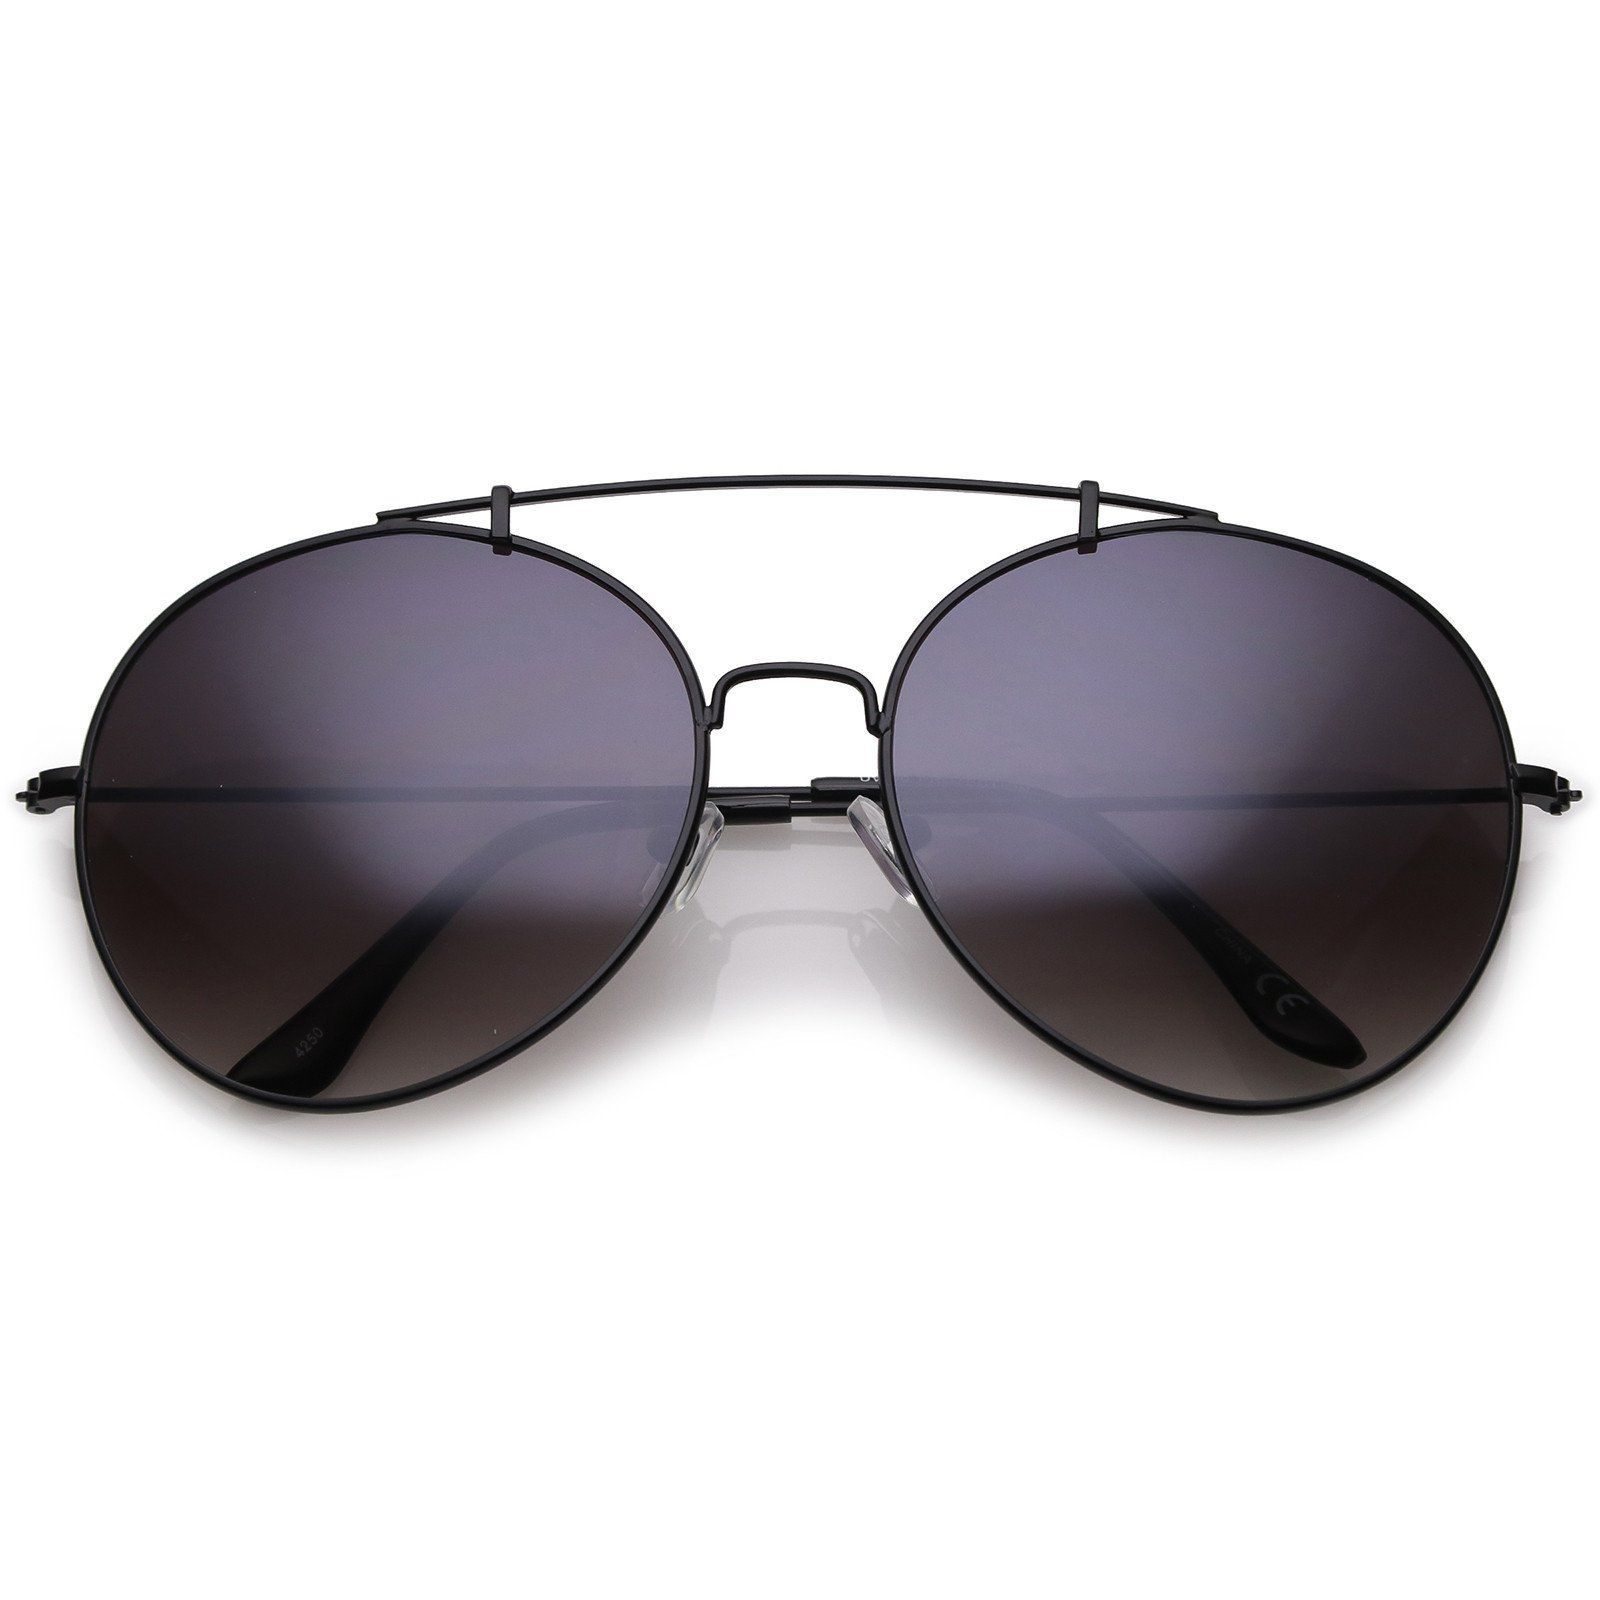 Classic Metal Aviator Sunglasses Crossbar Slim Arms Round Lens 65mm